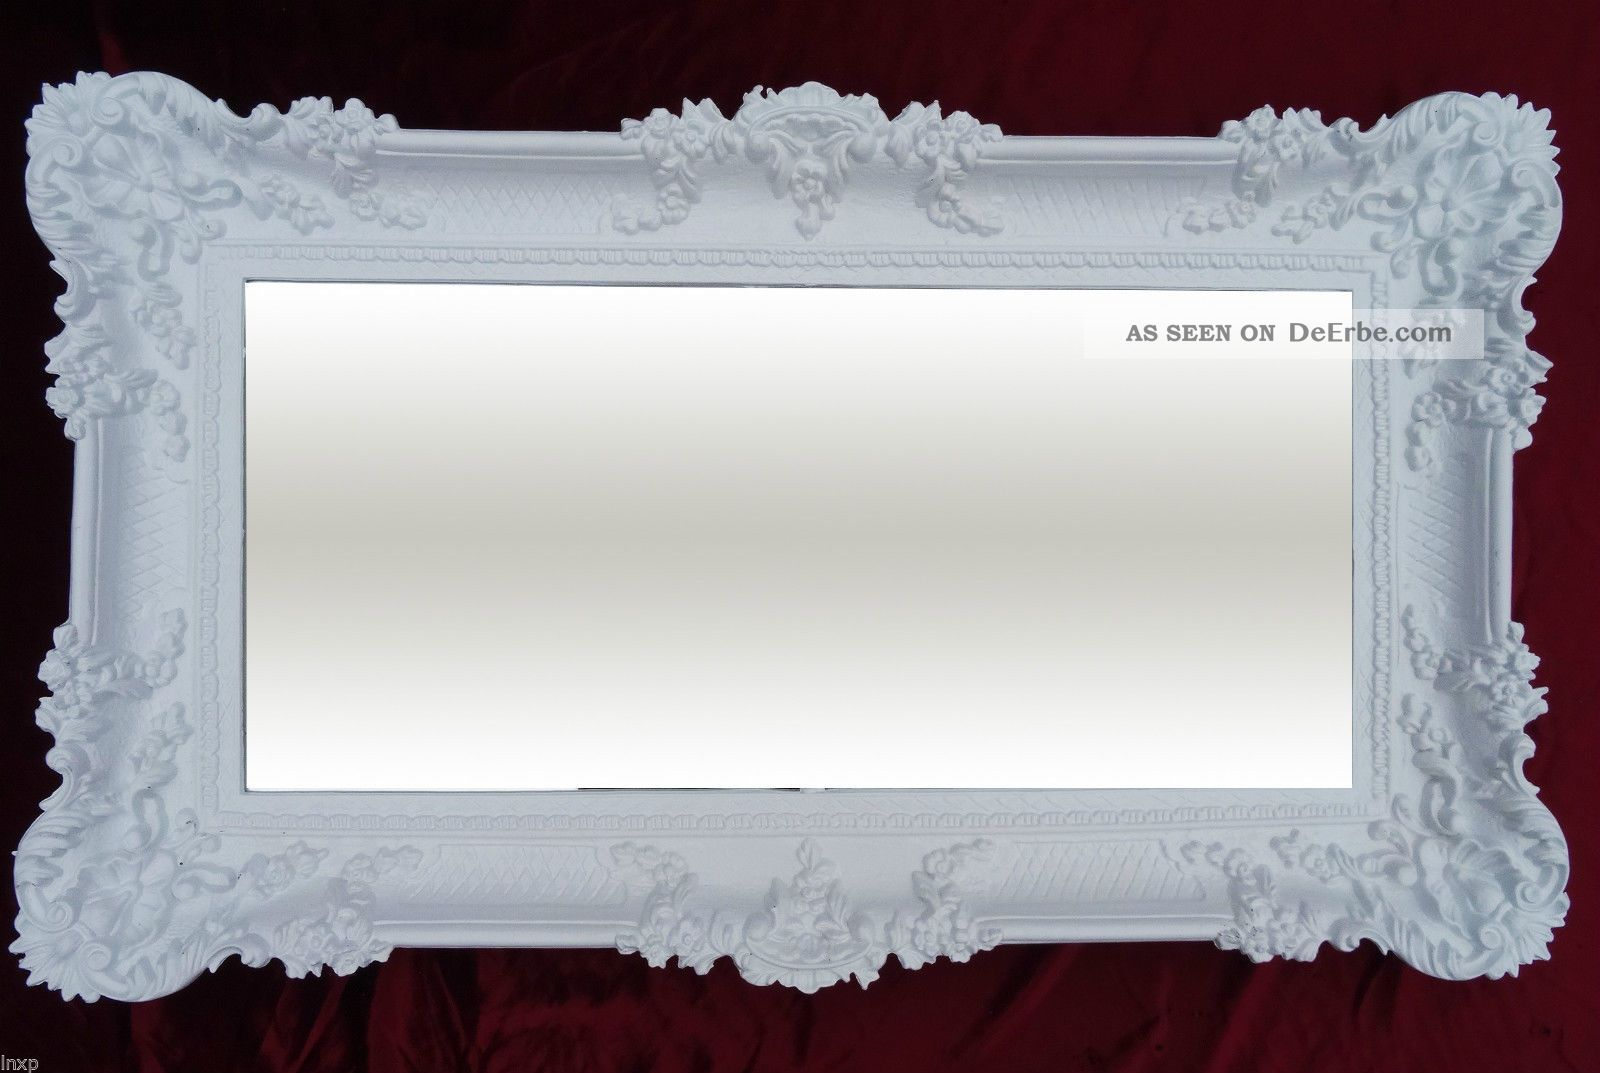 Wandspiegel Weiß 96 X57 Antik Barock Rokoko Spiegel Shabby Chic ...